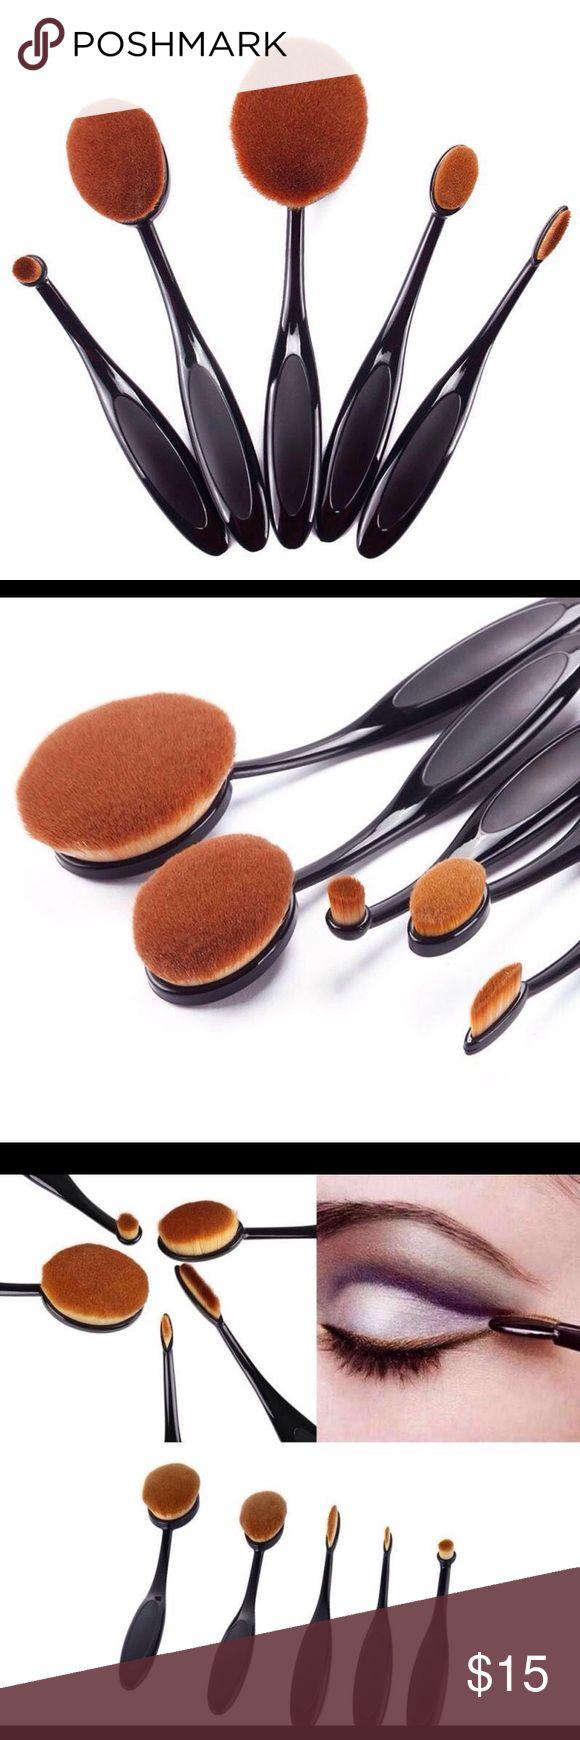 5 pcs Foundation Oval Brushes Set. 5 Pcs Cosmetic Oval